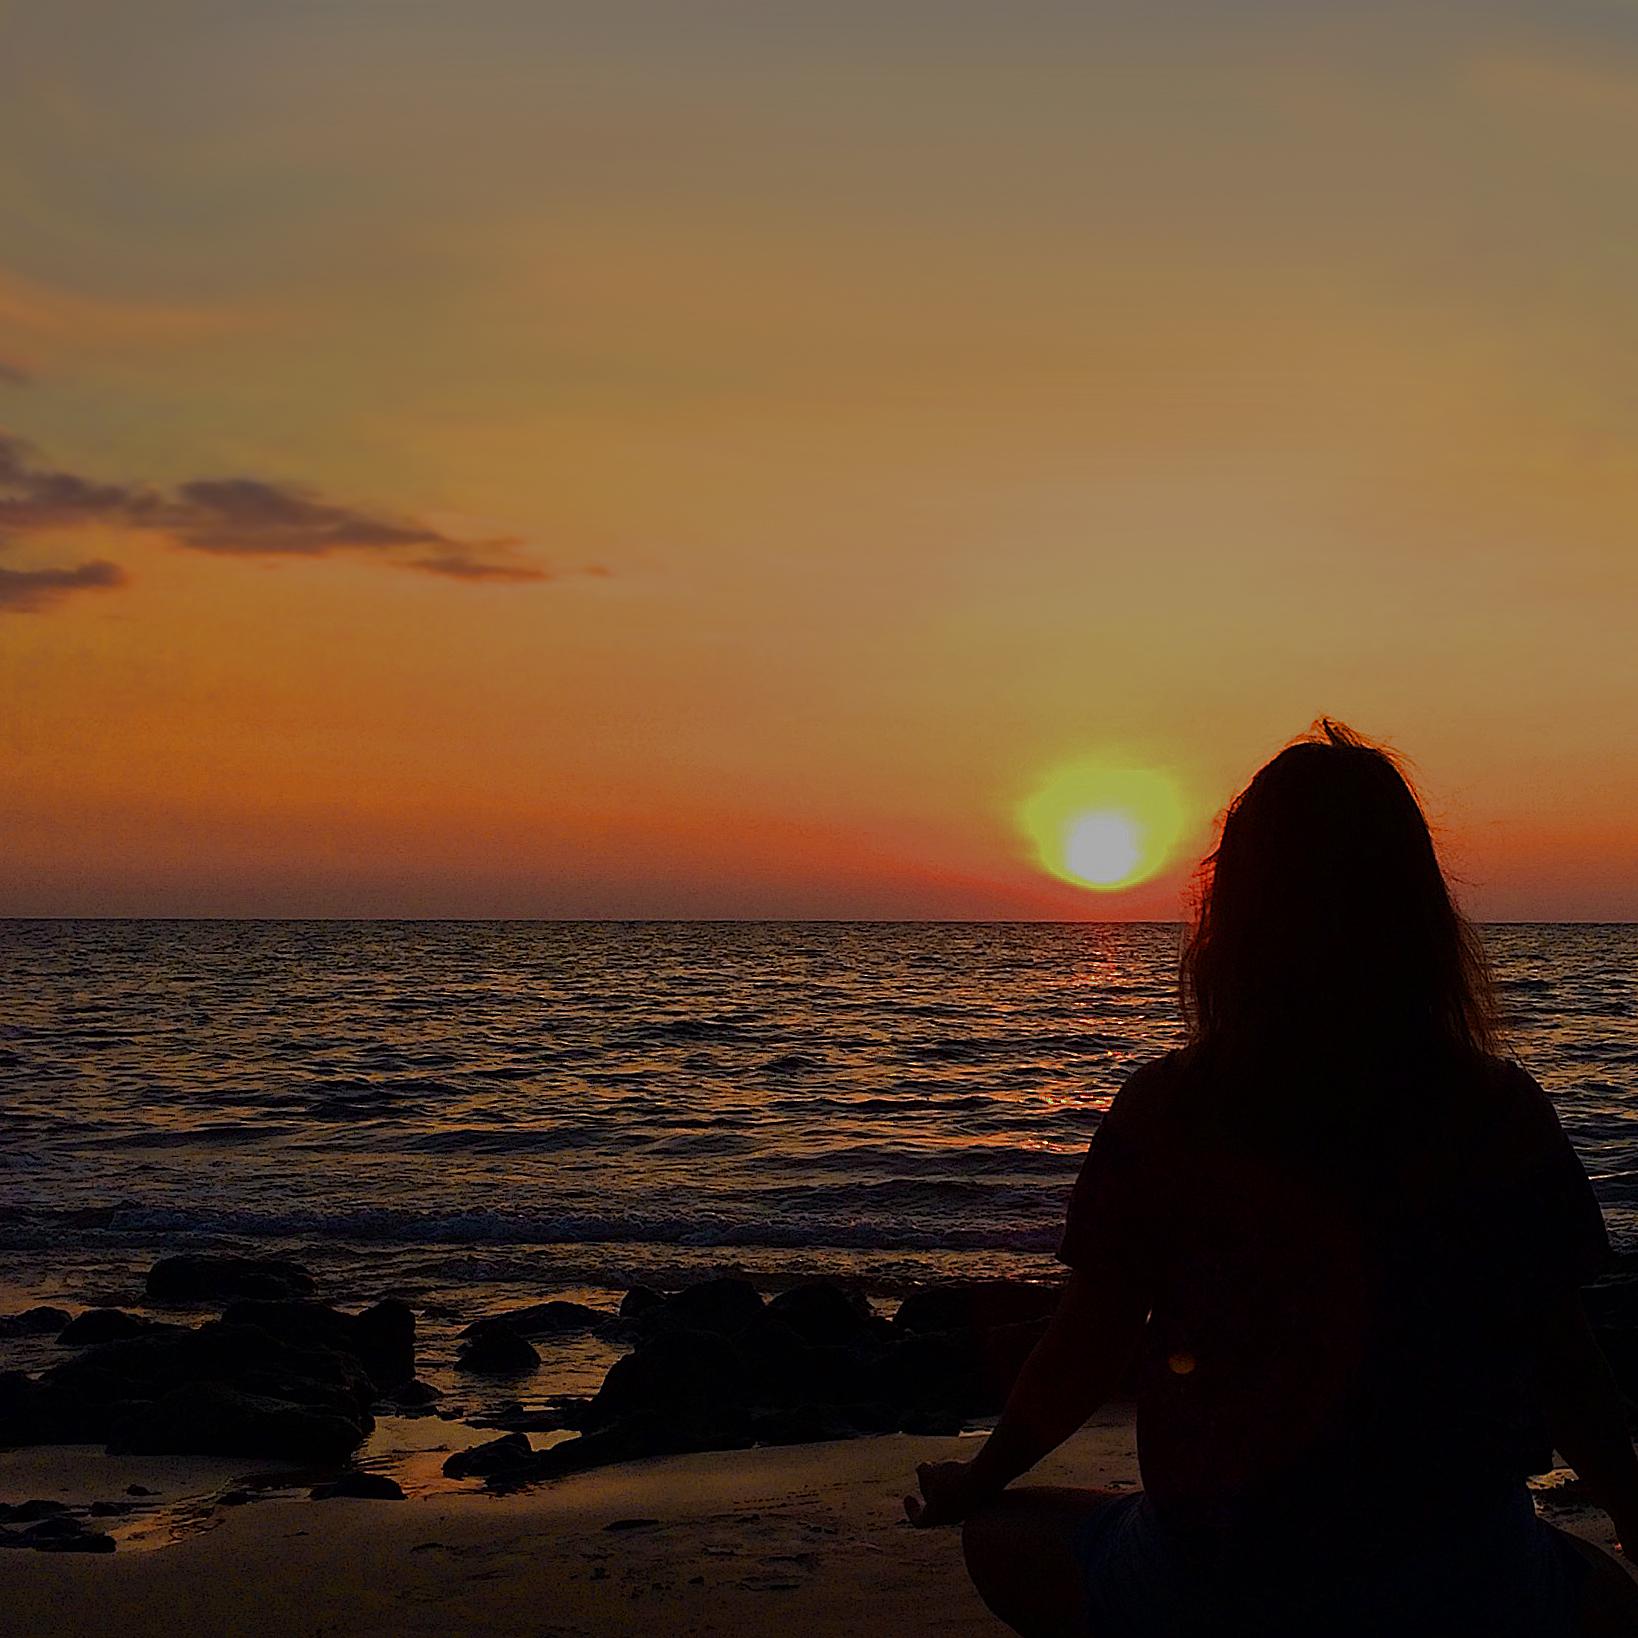 2016-sunset-bigisland-easyp